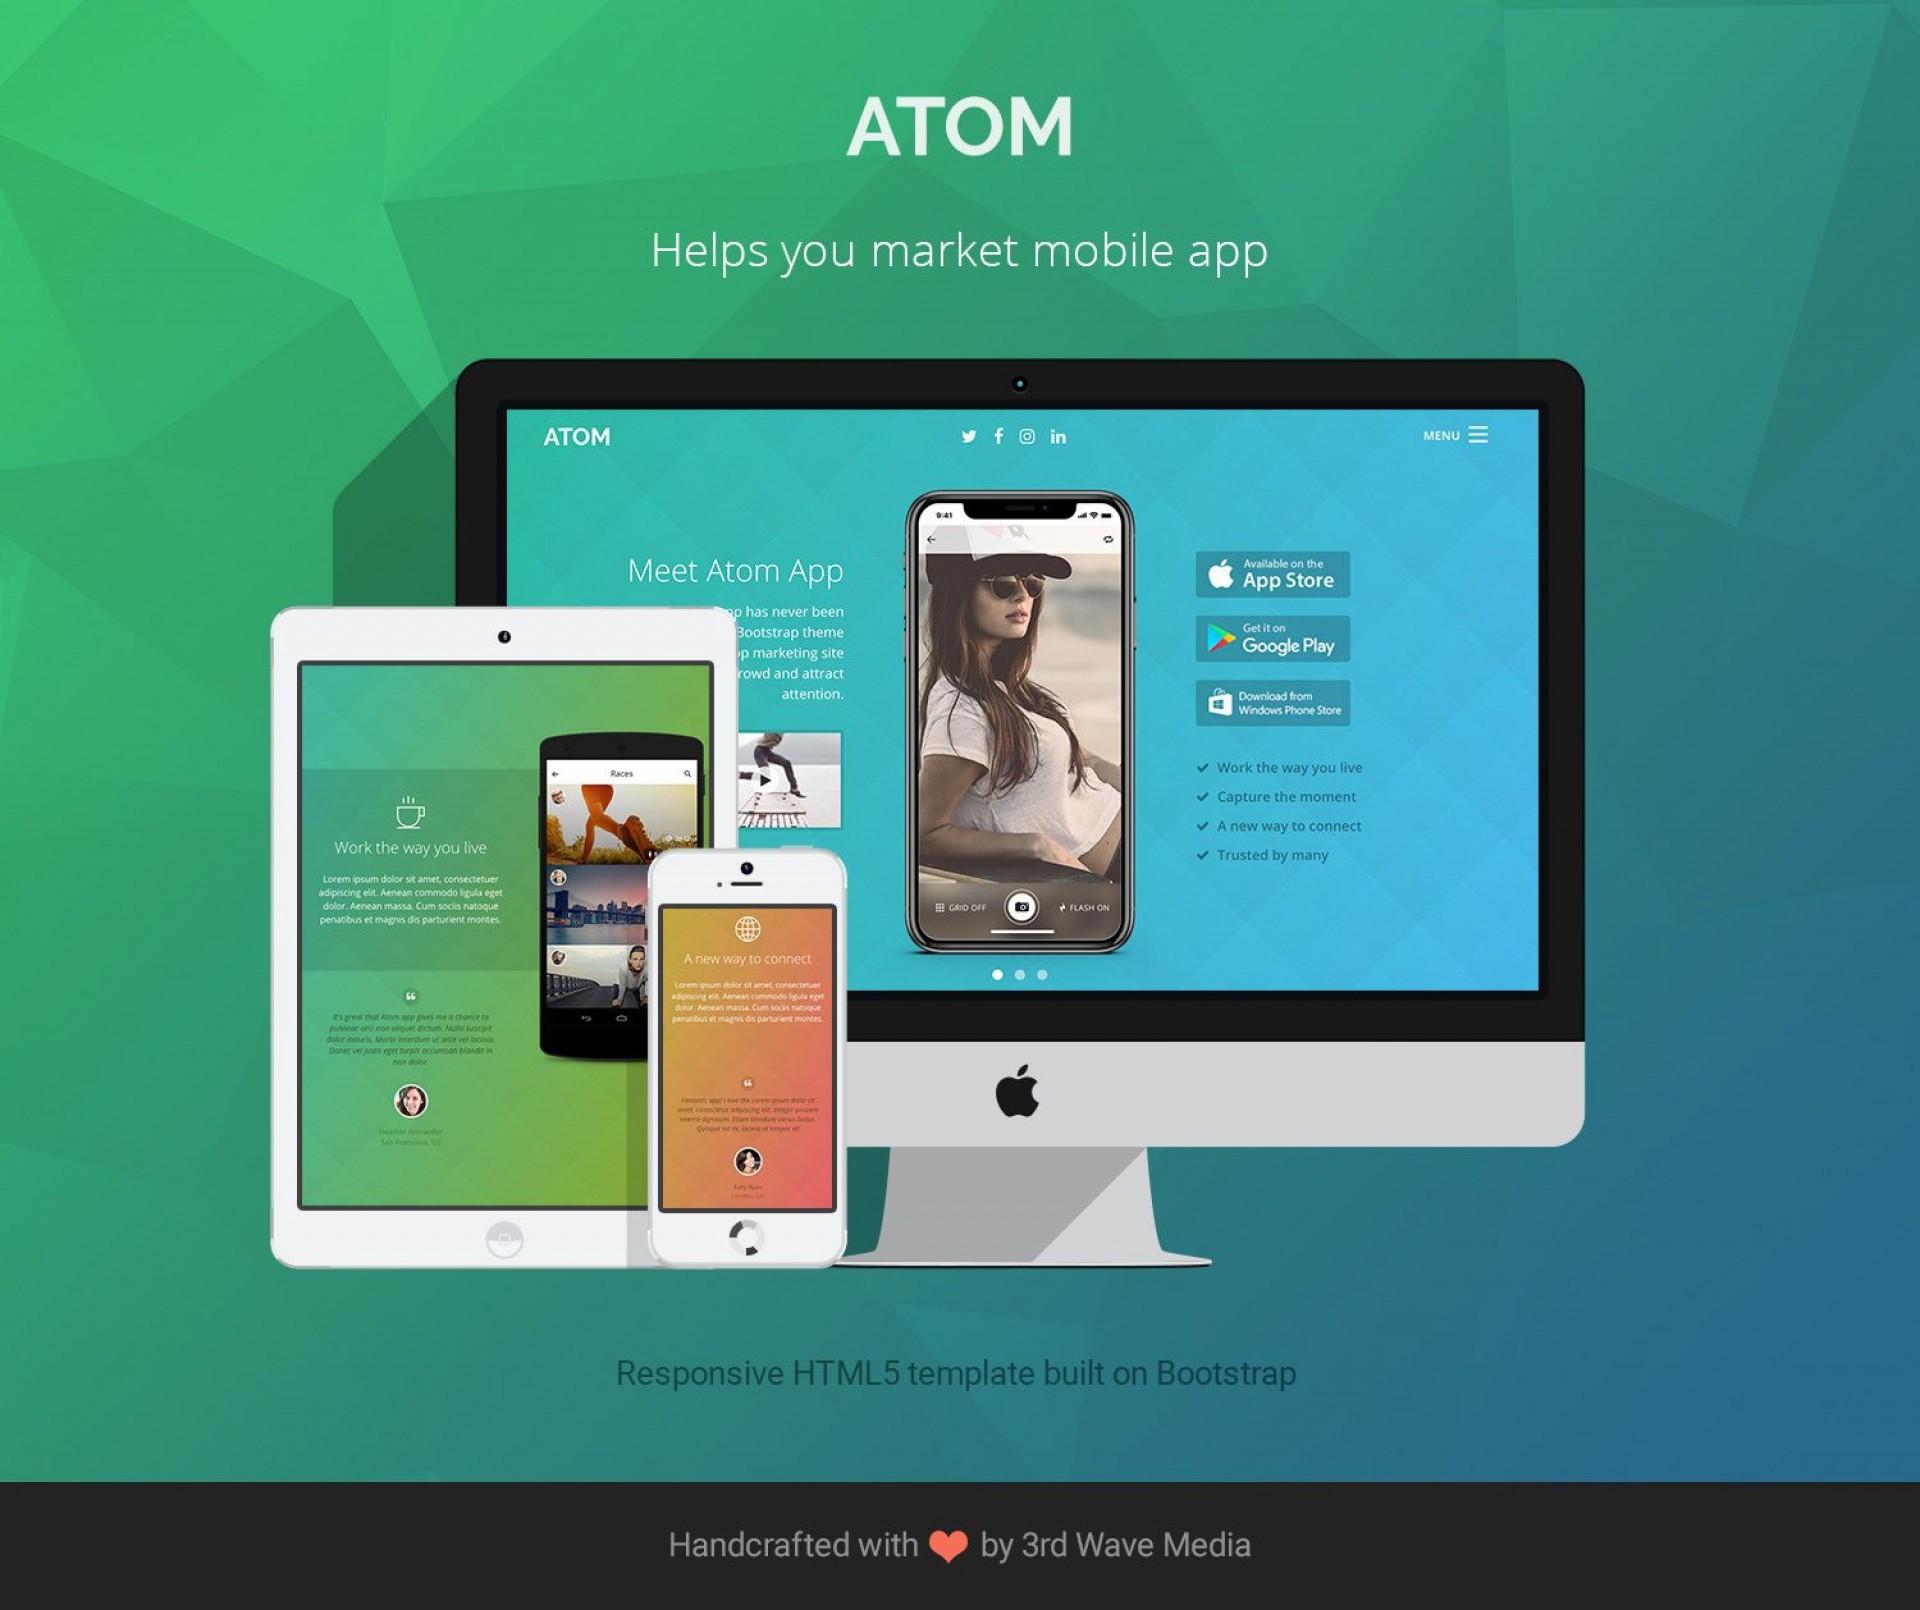 008 Wondrou Bootstrap Mobile App Template Image  Html5 Form 41920